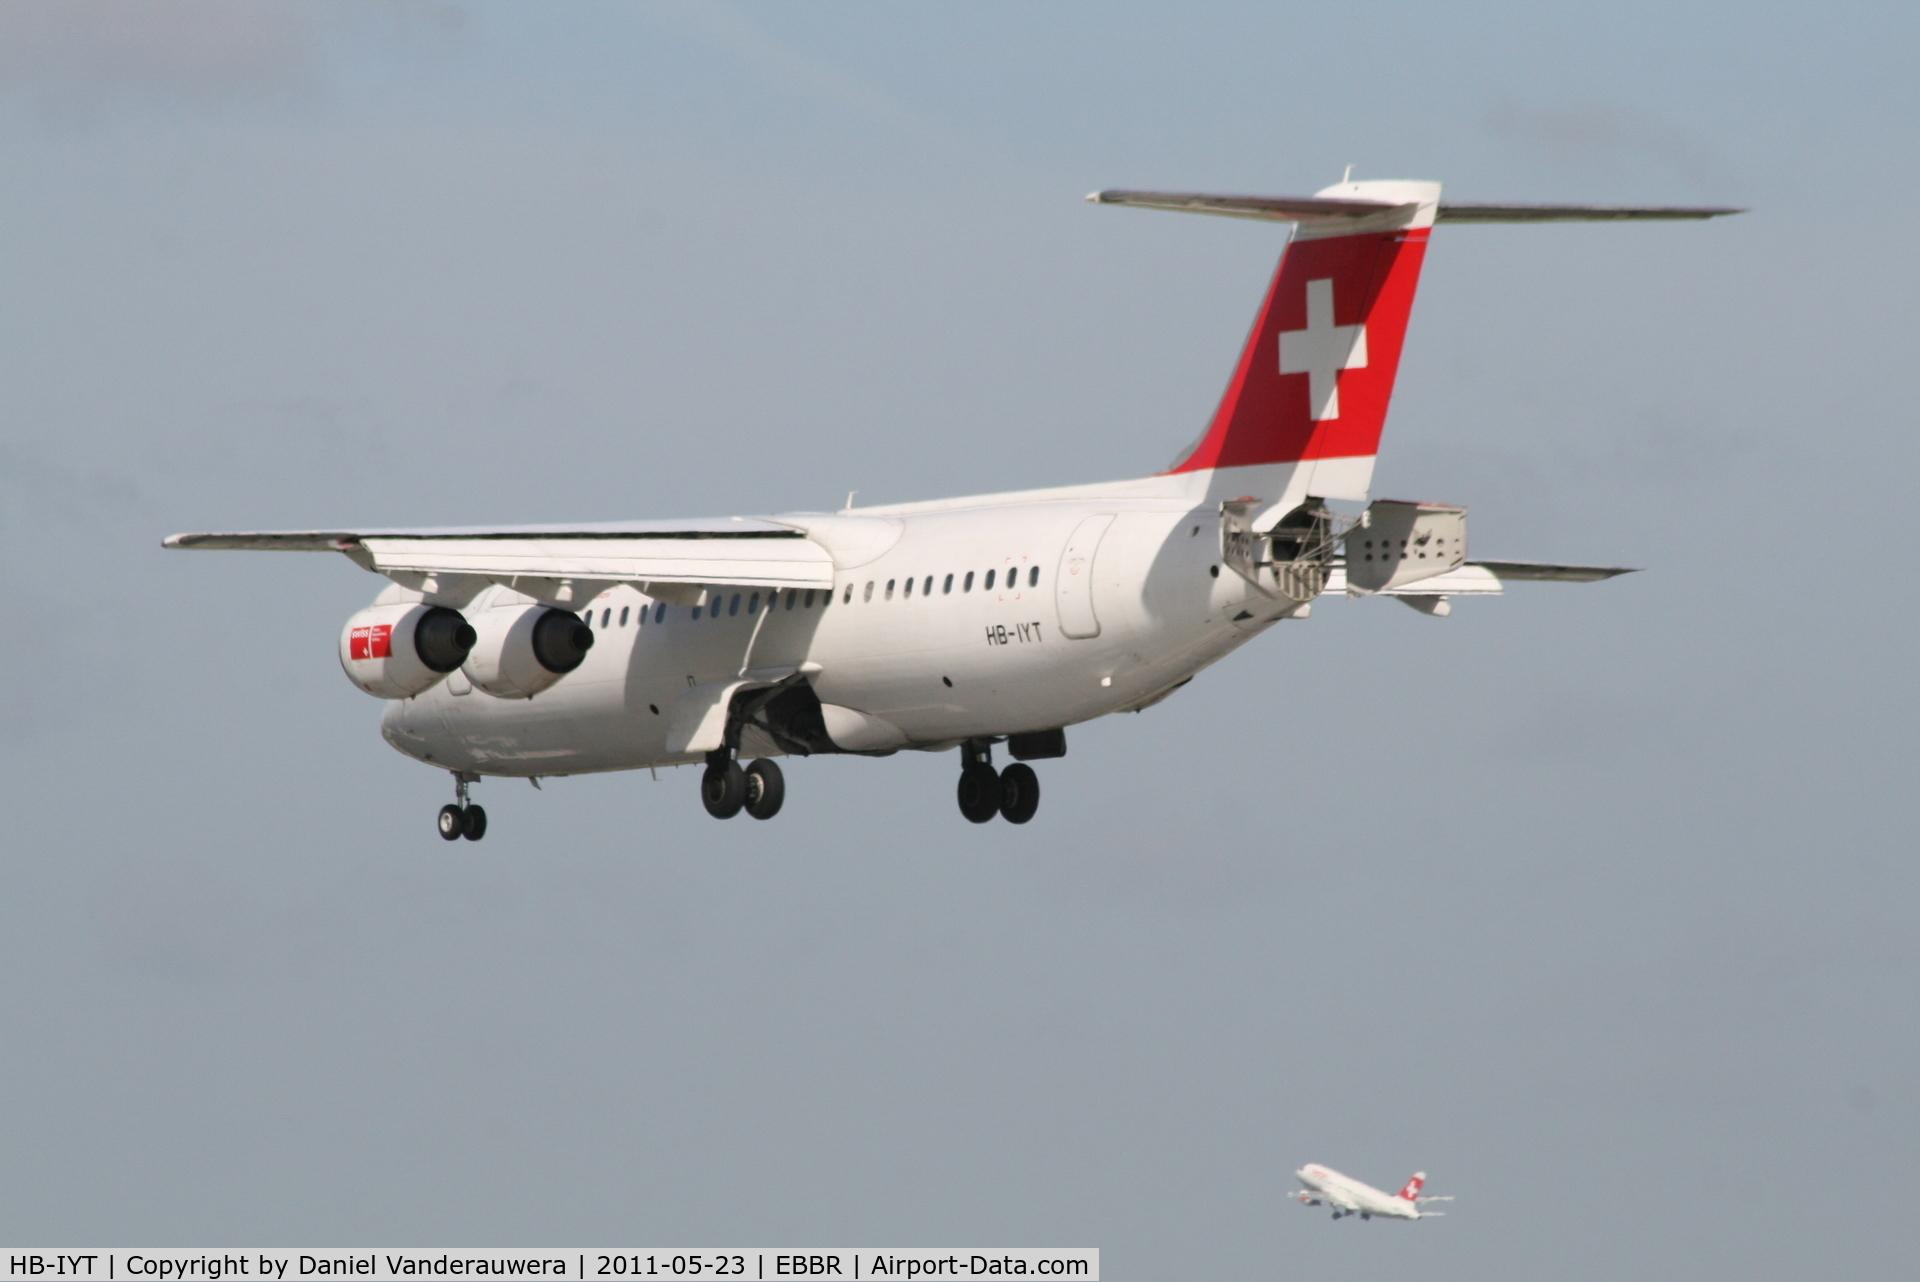 HB-IYT, 2000 British Aerospace Avro 146-RJ100 C/N E3380, Flight LX778 (ARJ-100  HB-IYT) is descending to RWY 25L while flight LX787 (A319-112  HB-IPR) is taking-off from RWY 25R